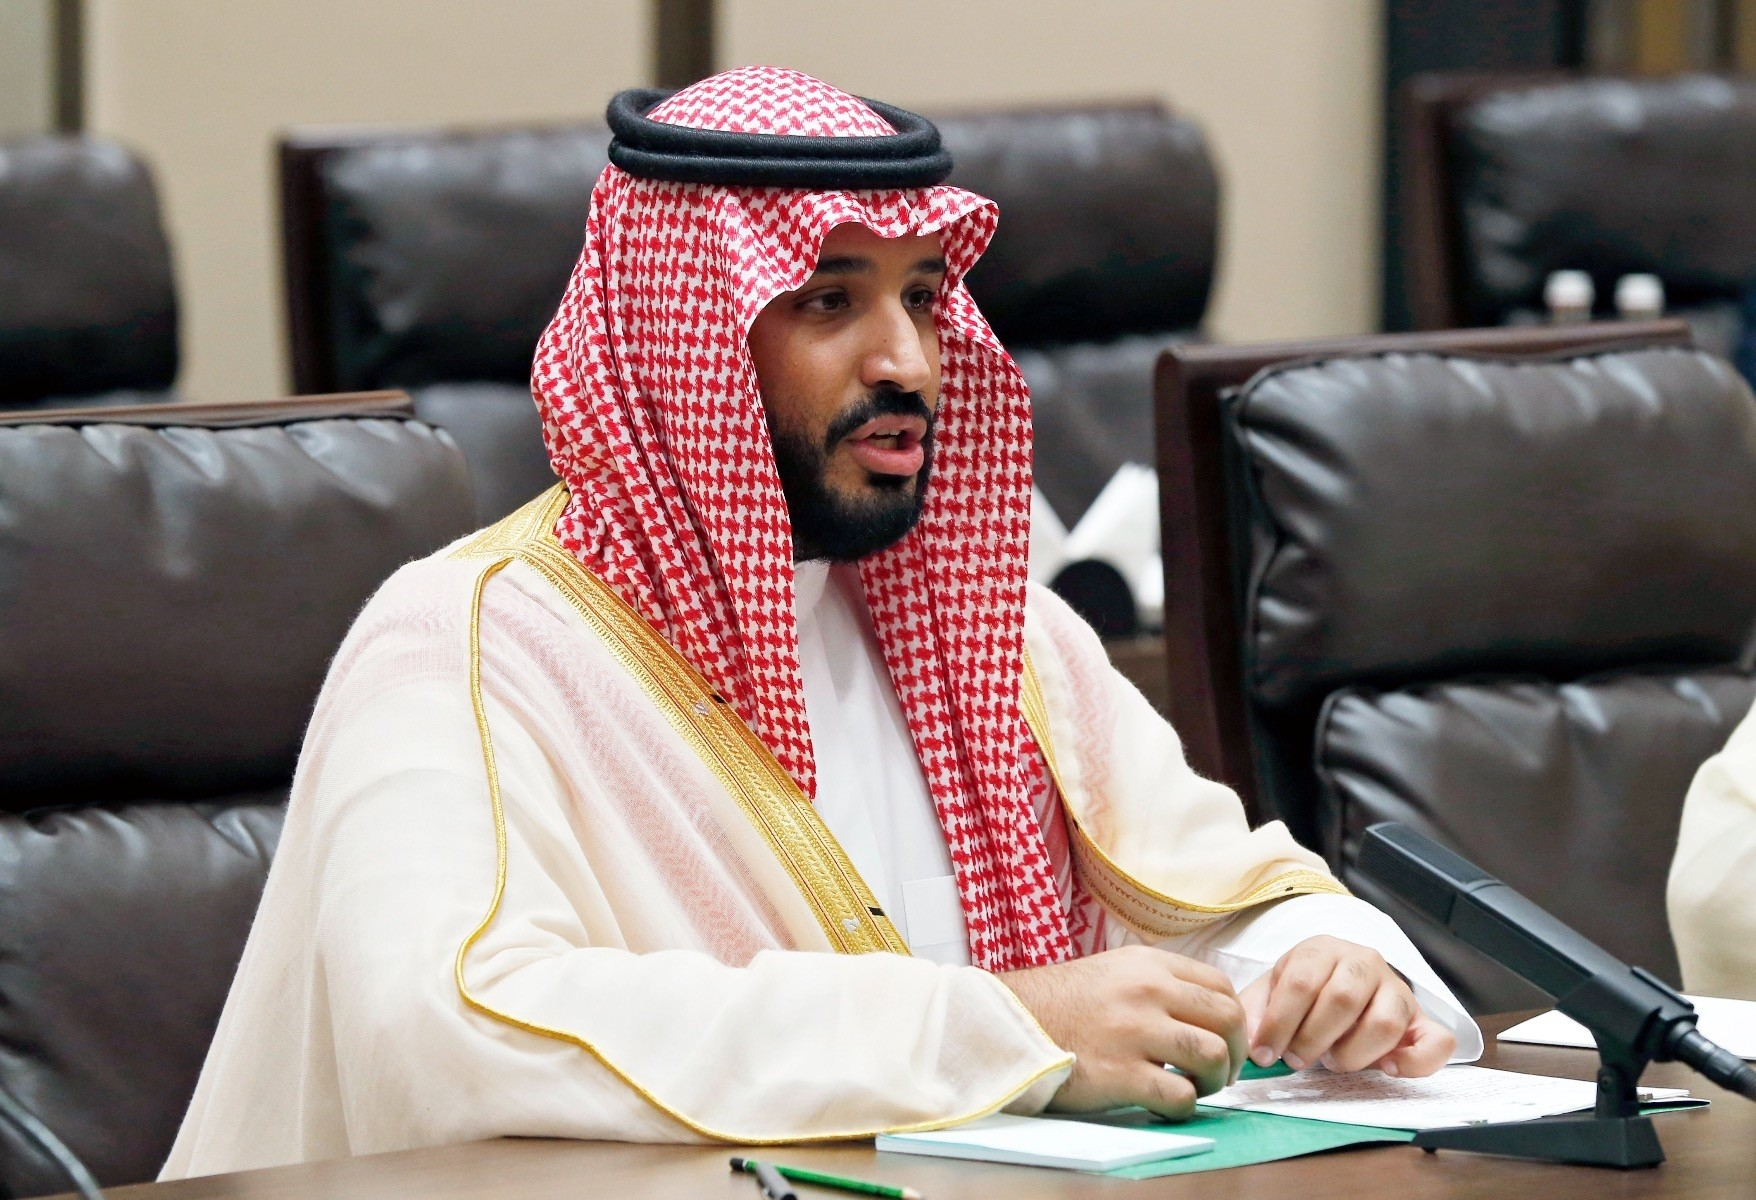 Prince Mohammed bin Salman of Saudi Arabia during the G20 Summit in Hangzhou, China, Sept. 4, 2016.